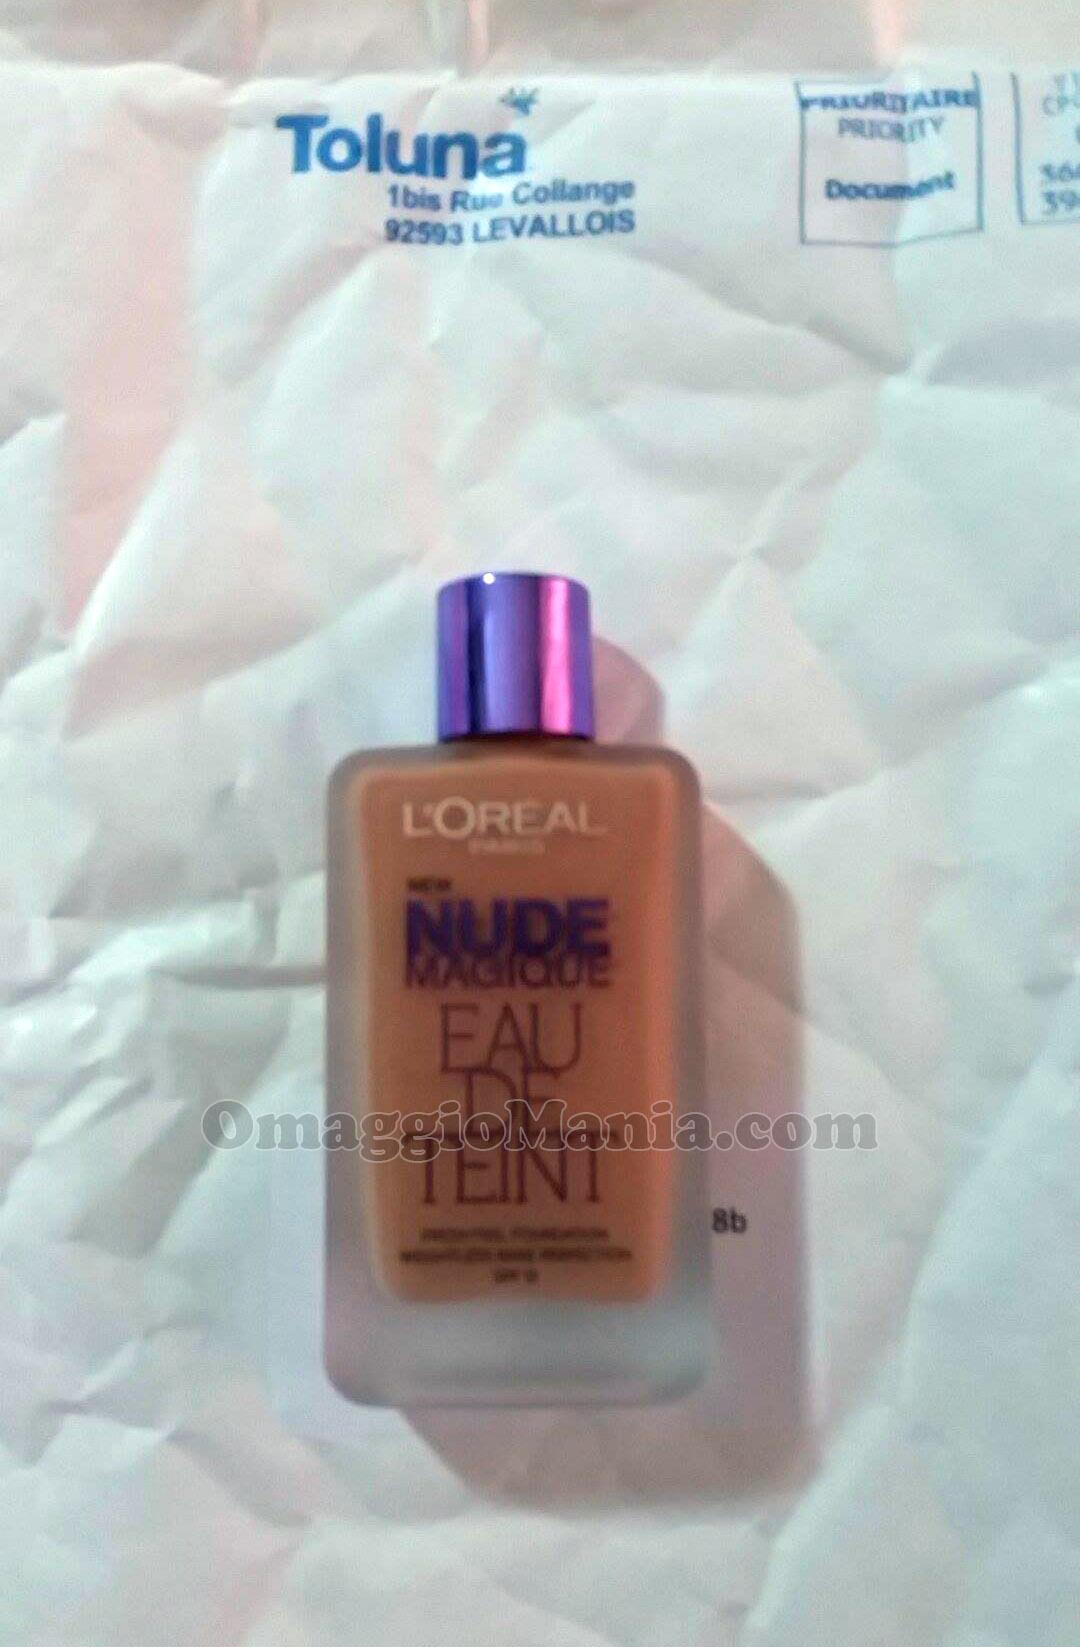 fondotinta L'Oréal Nude Magique Eau de Teint di Edy con Toluna